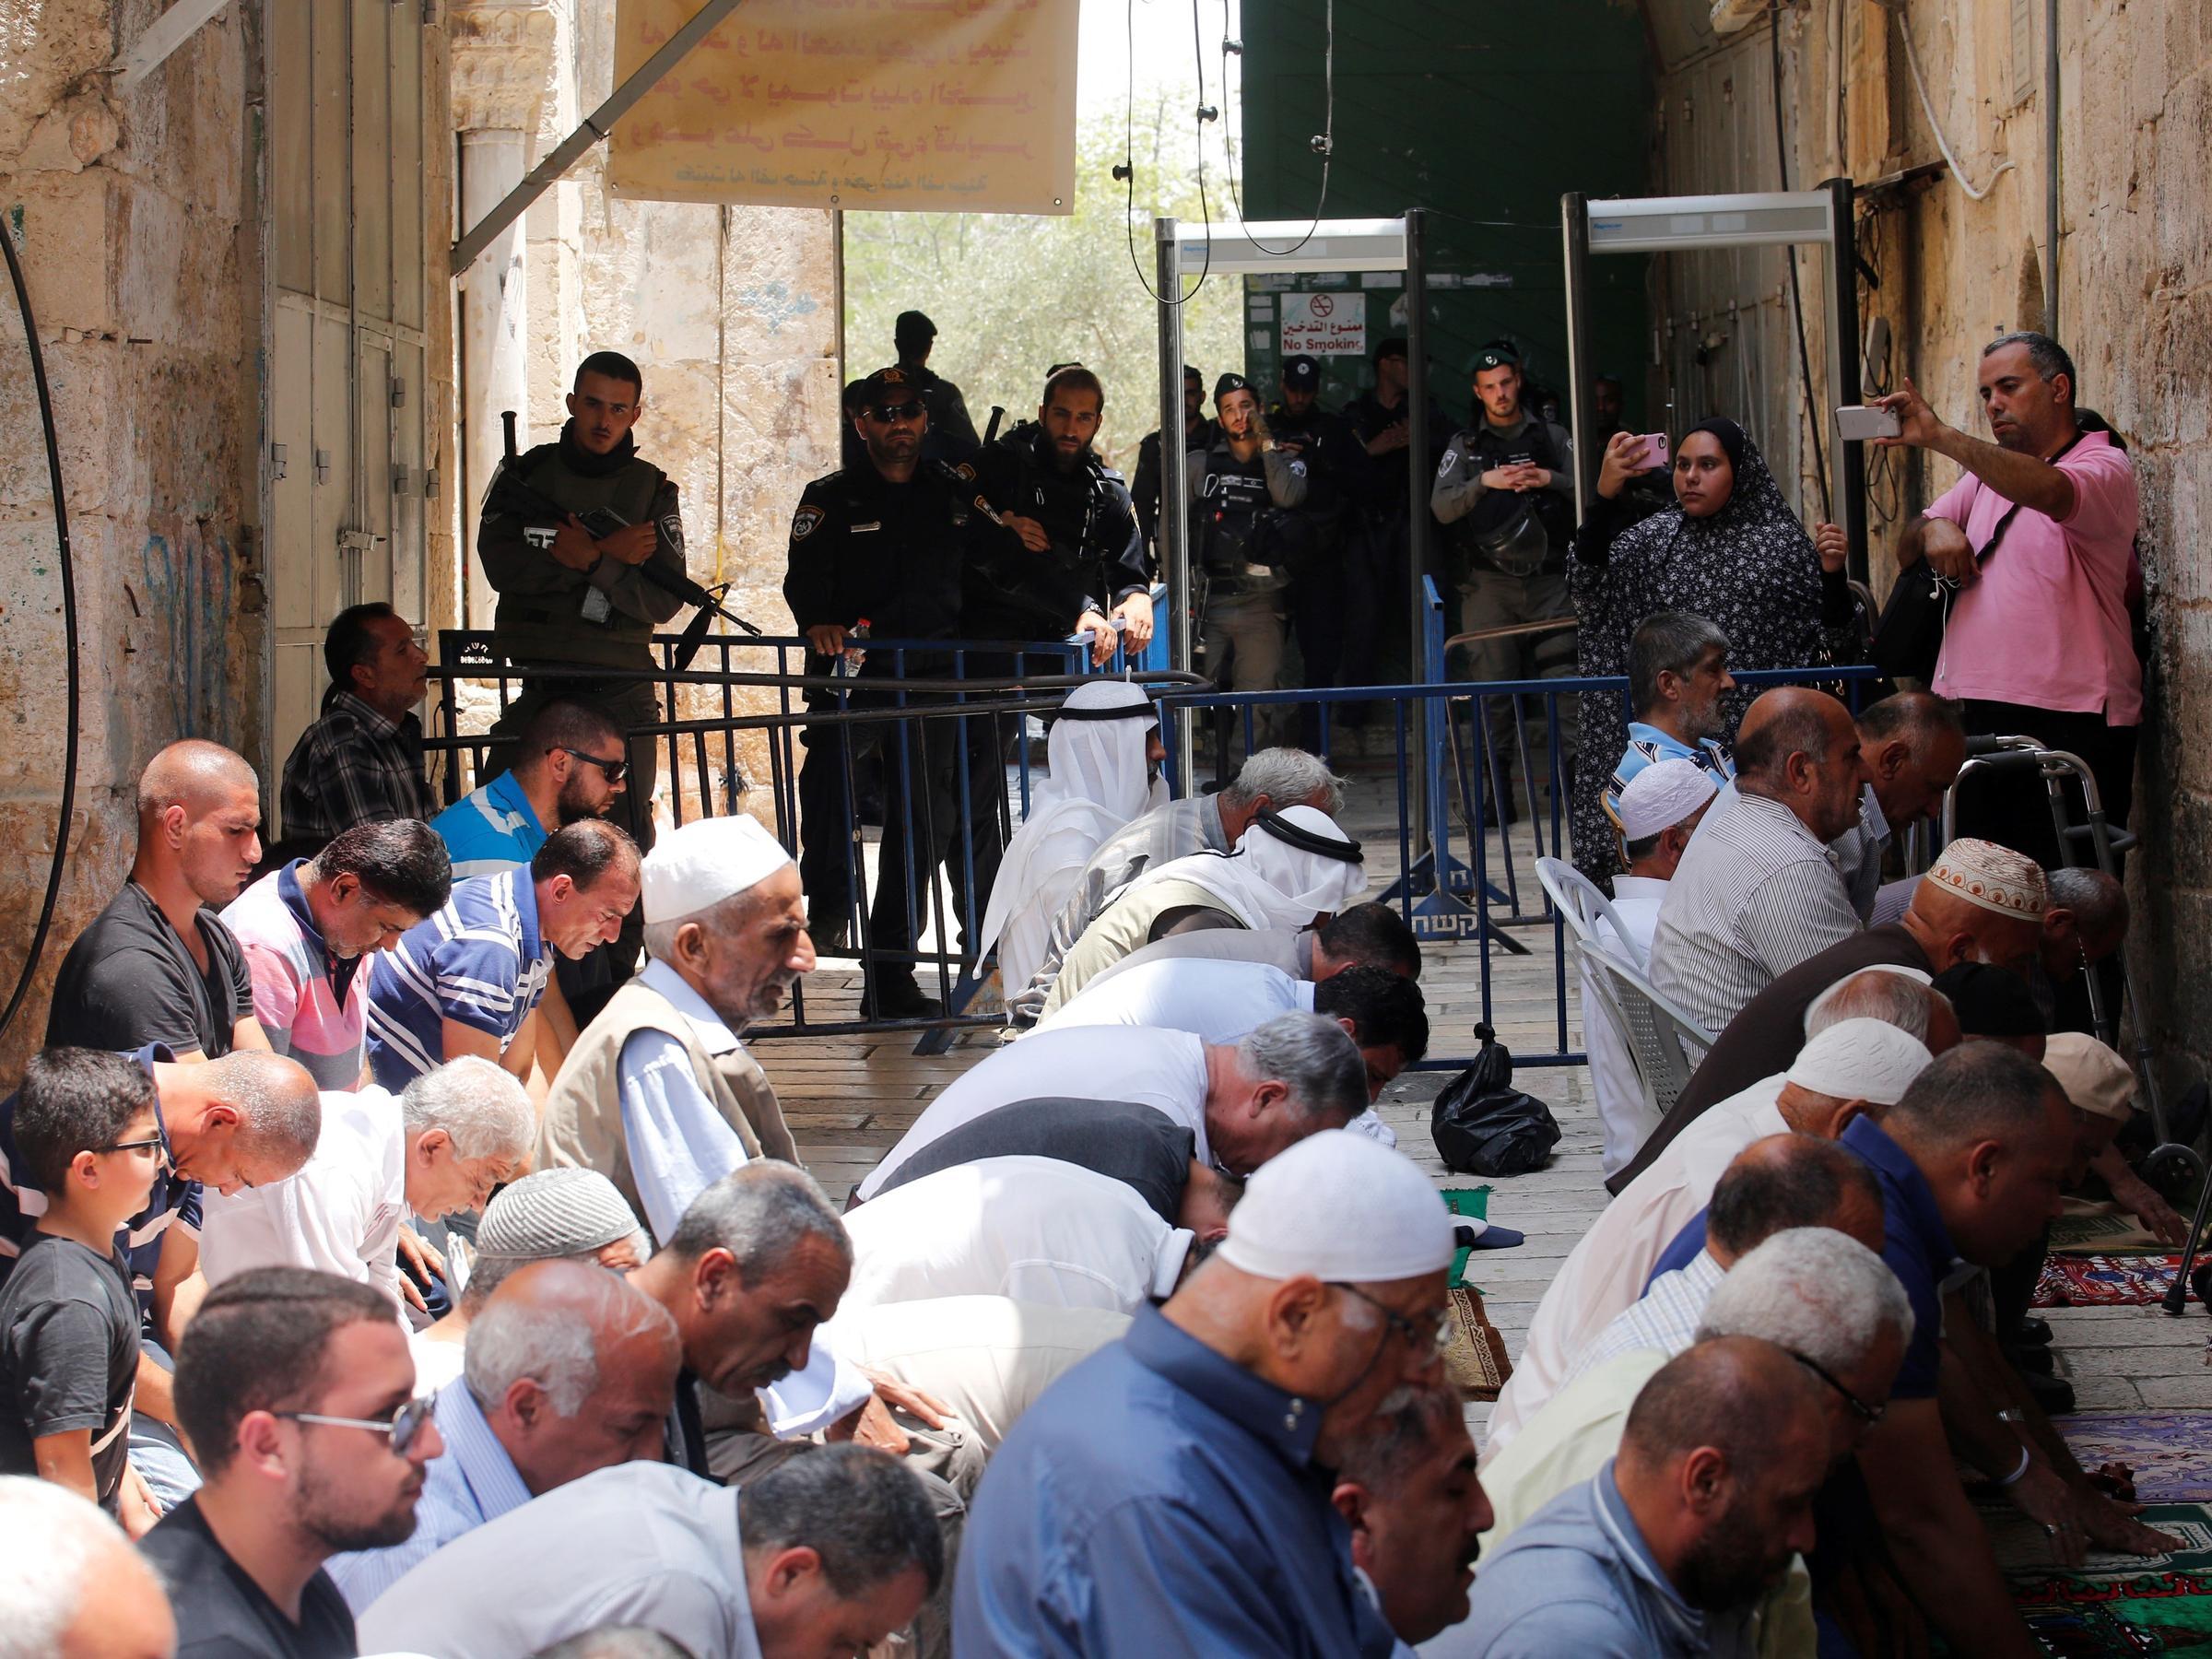 Tensions Rise in Jerusalem After Israel Installs Metal Detectors at Mosque